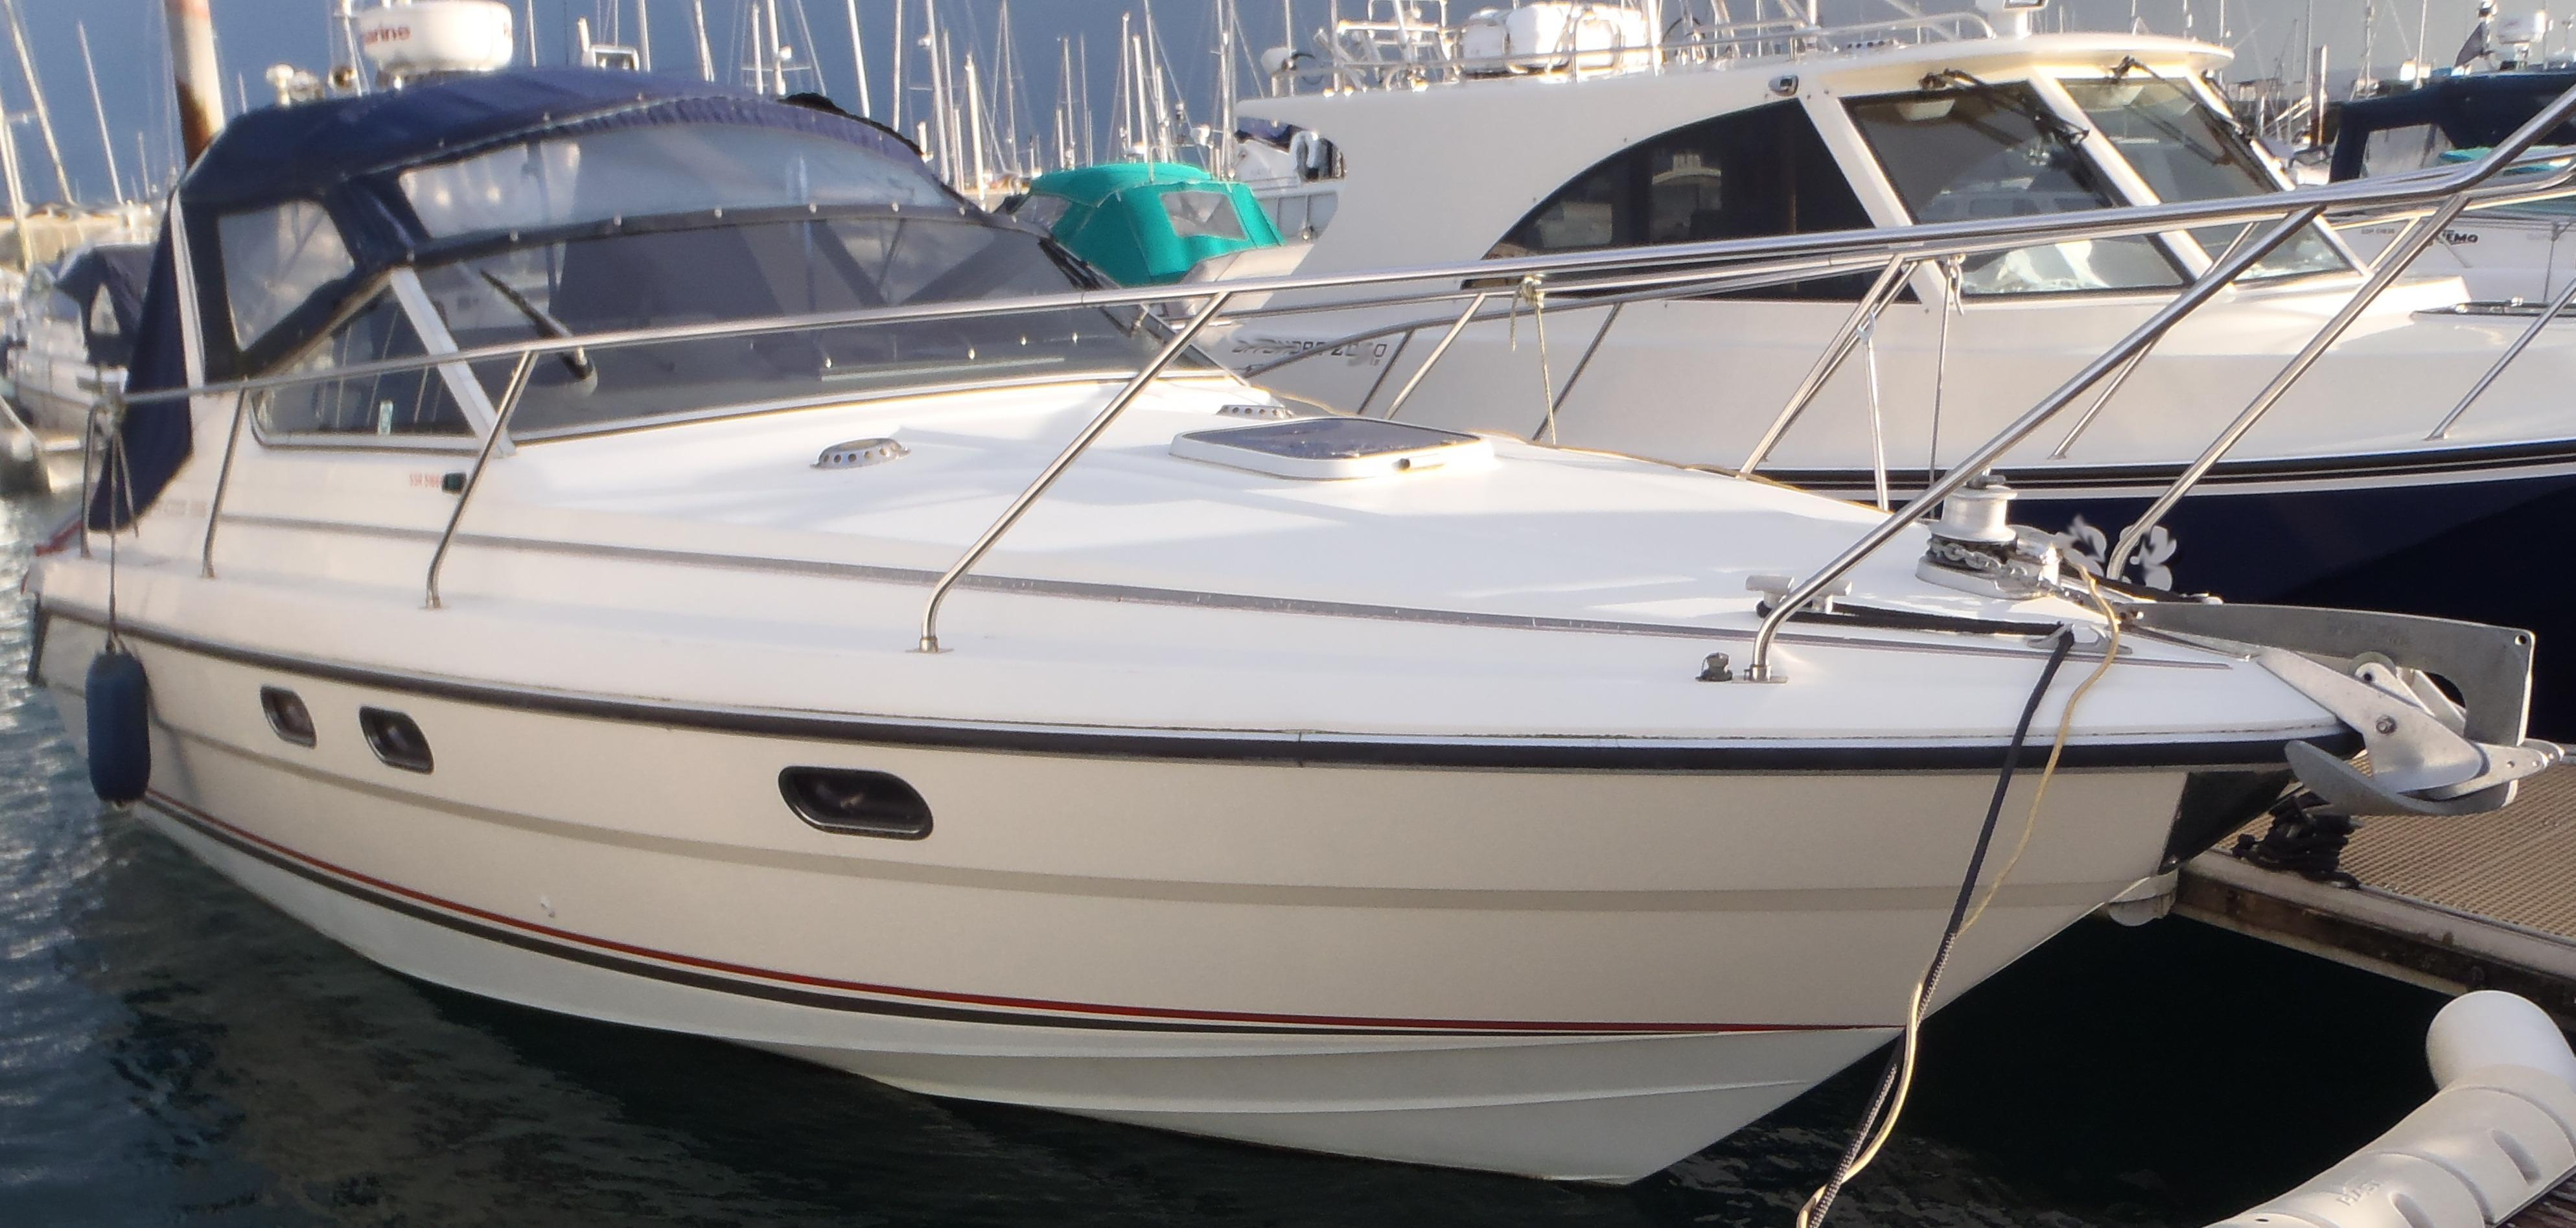 Princess 266 Riviera, Channel Islands